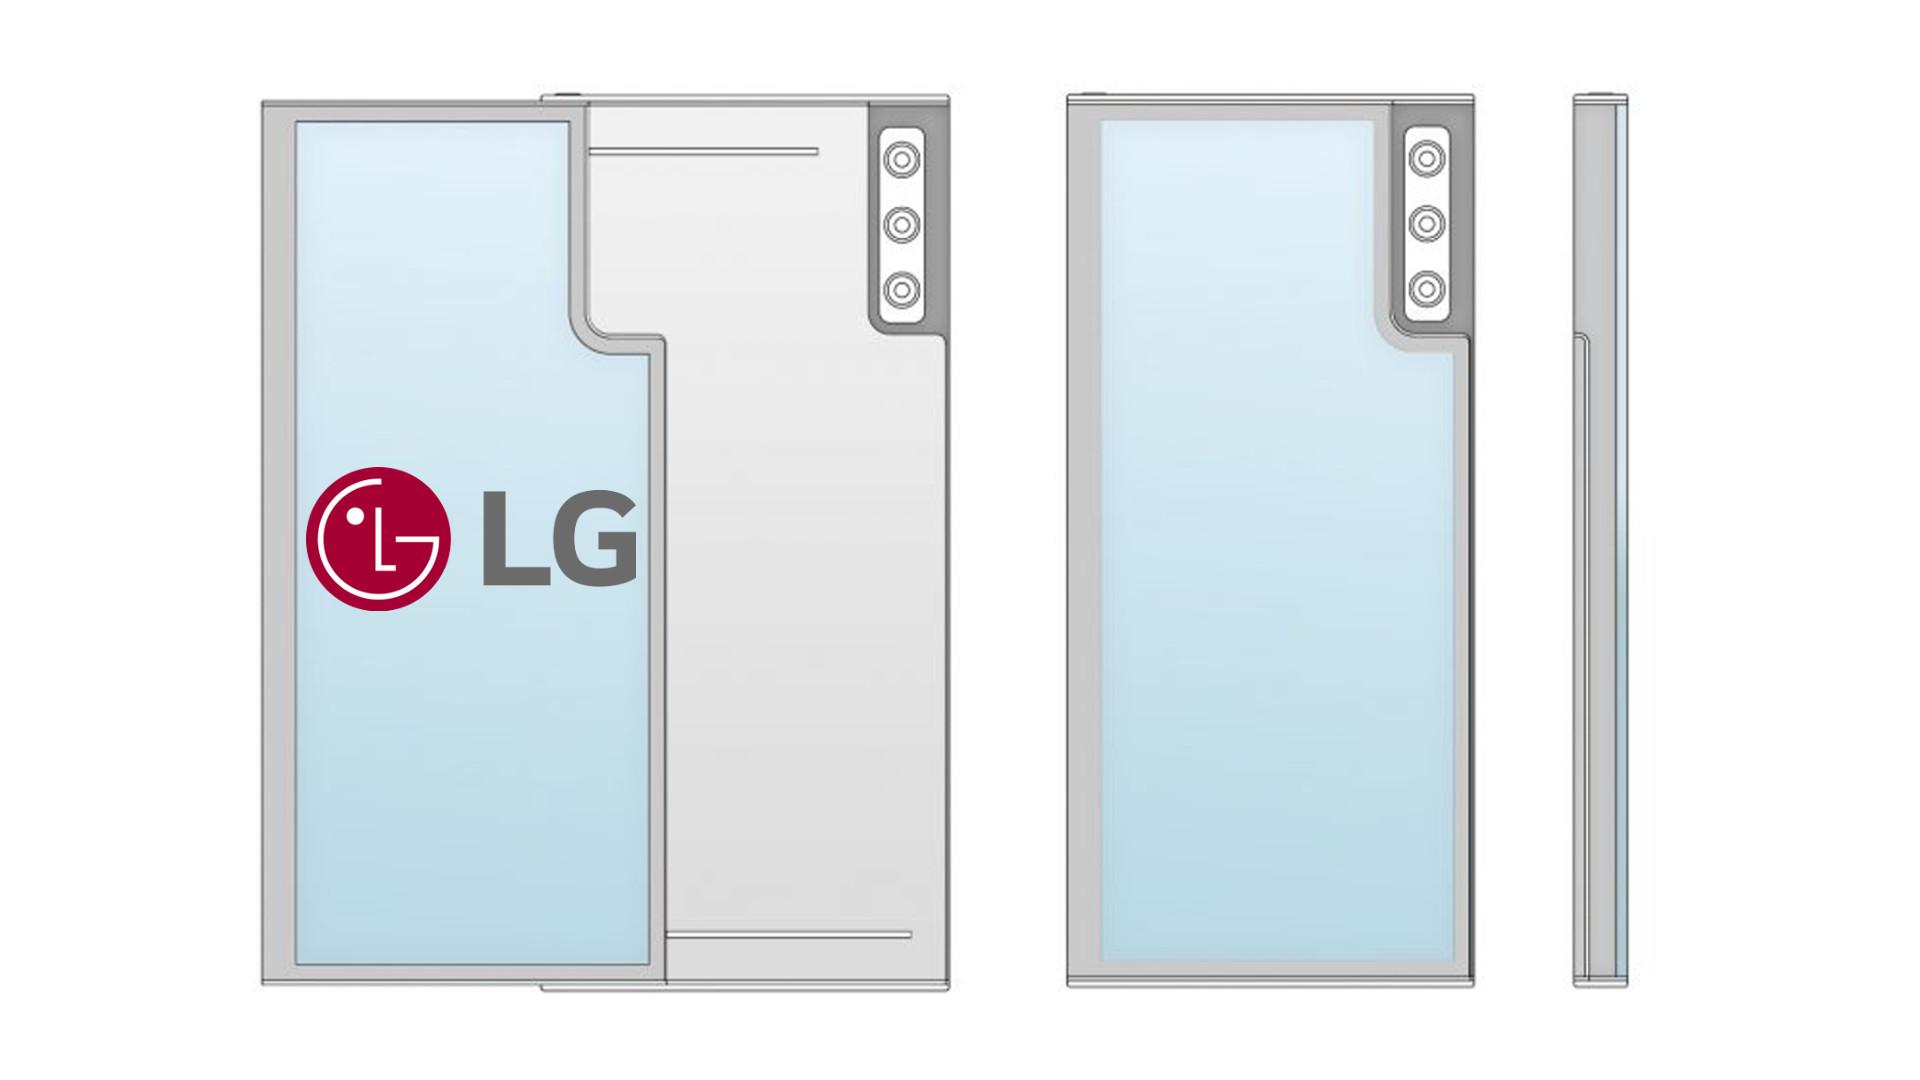 Nueva patente de LG: Enrollable con doble pantalla